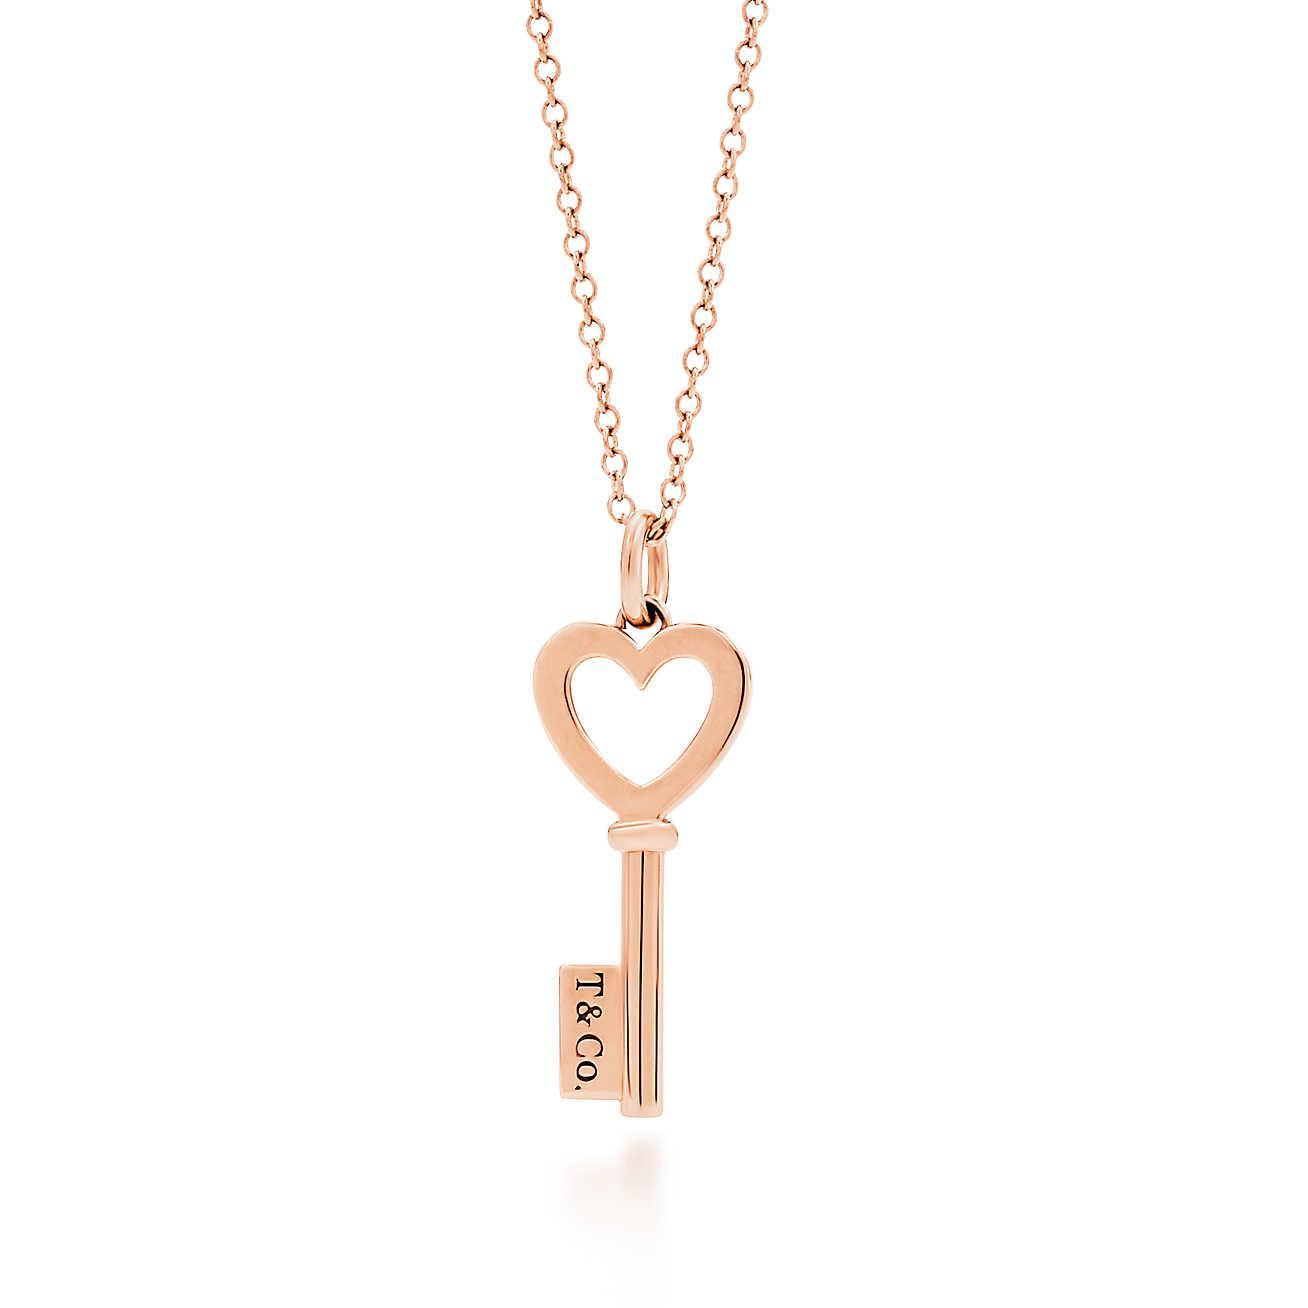 ae82576e94a05 Women's Metallic Heart Key Pendant In 18k Rose Gold, Mini